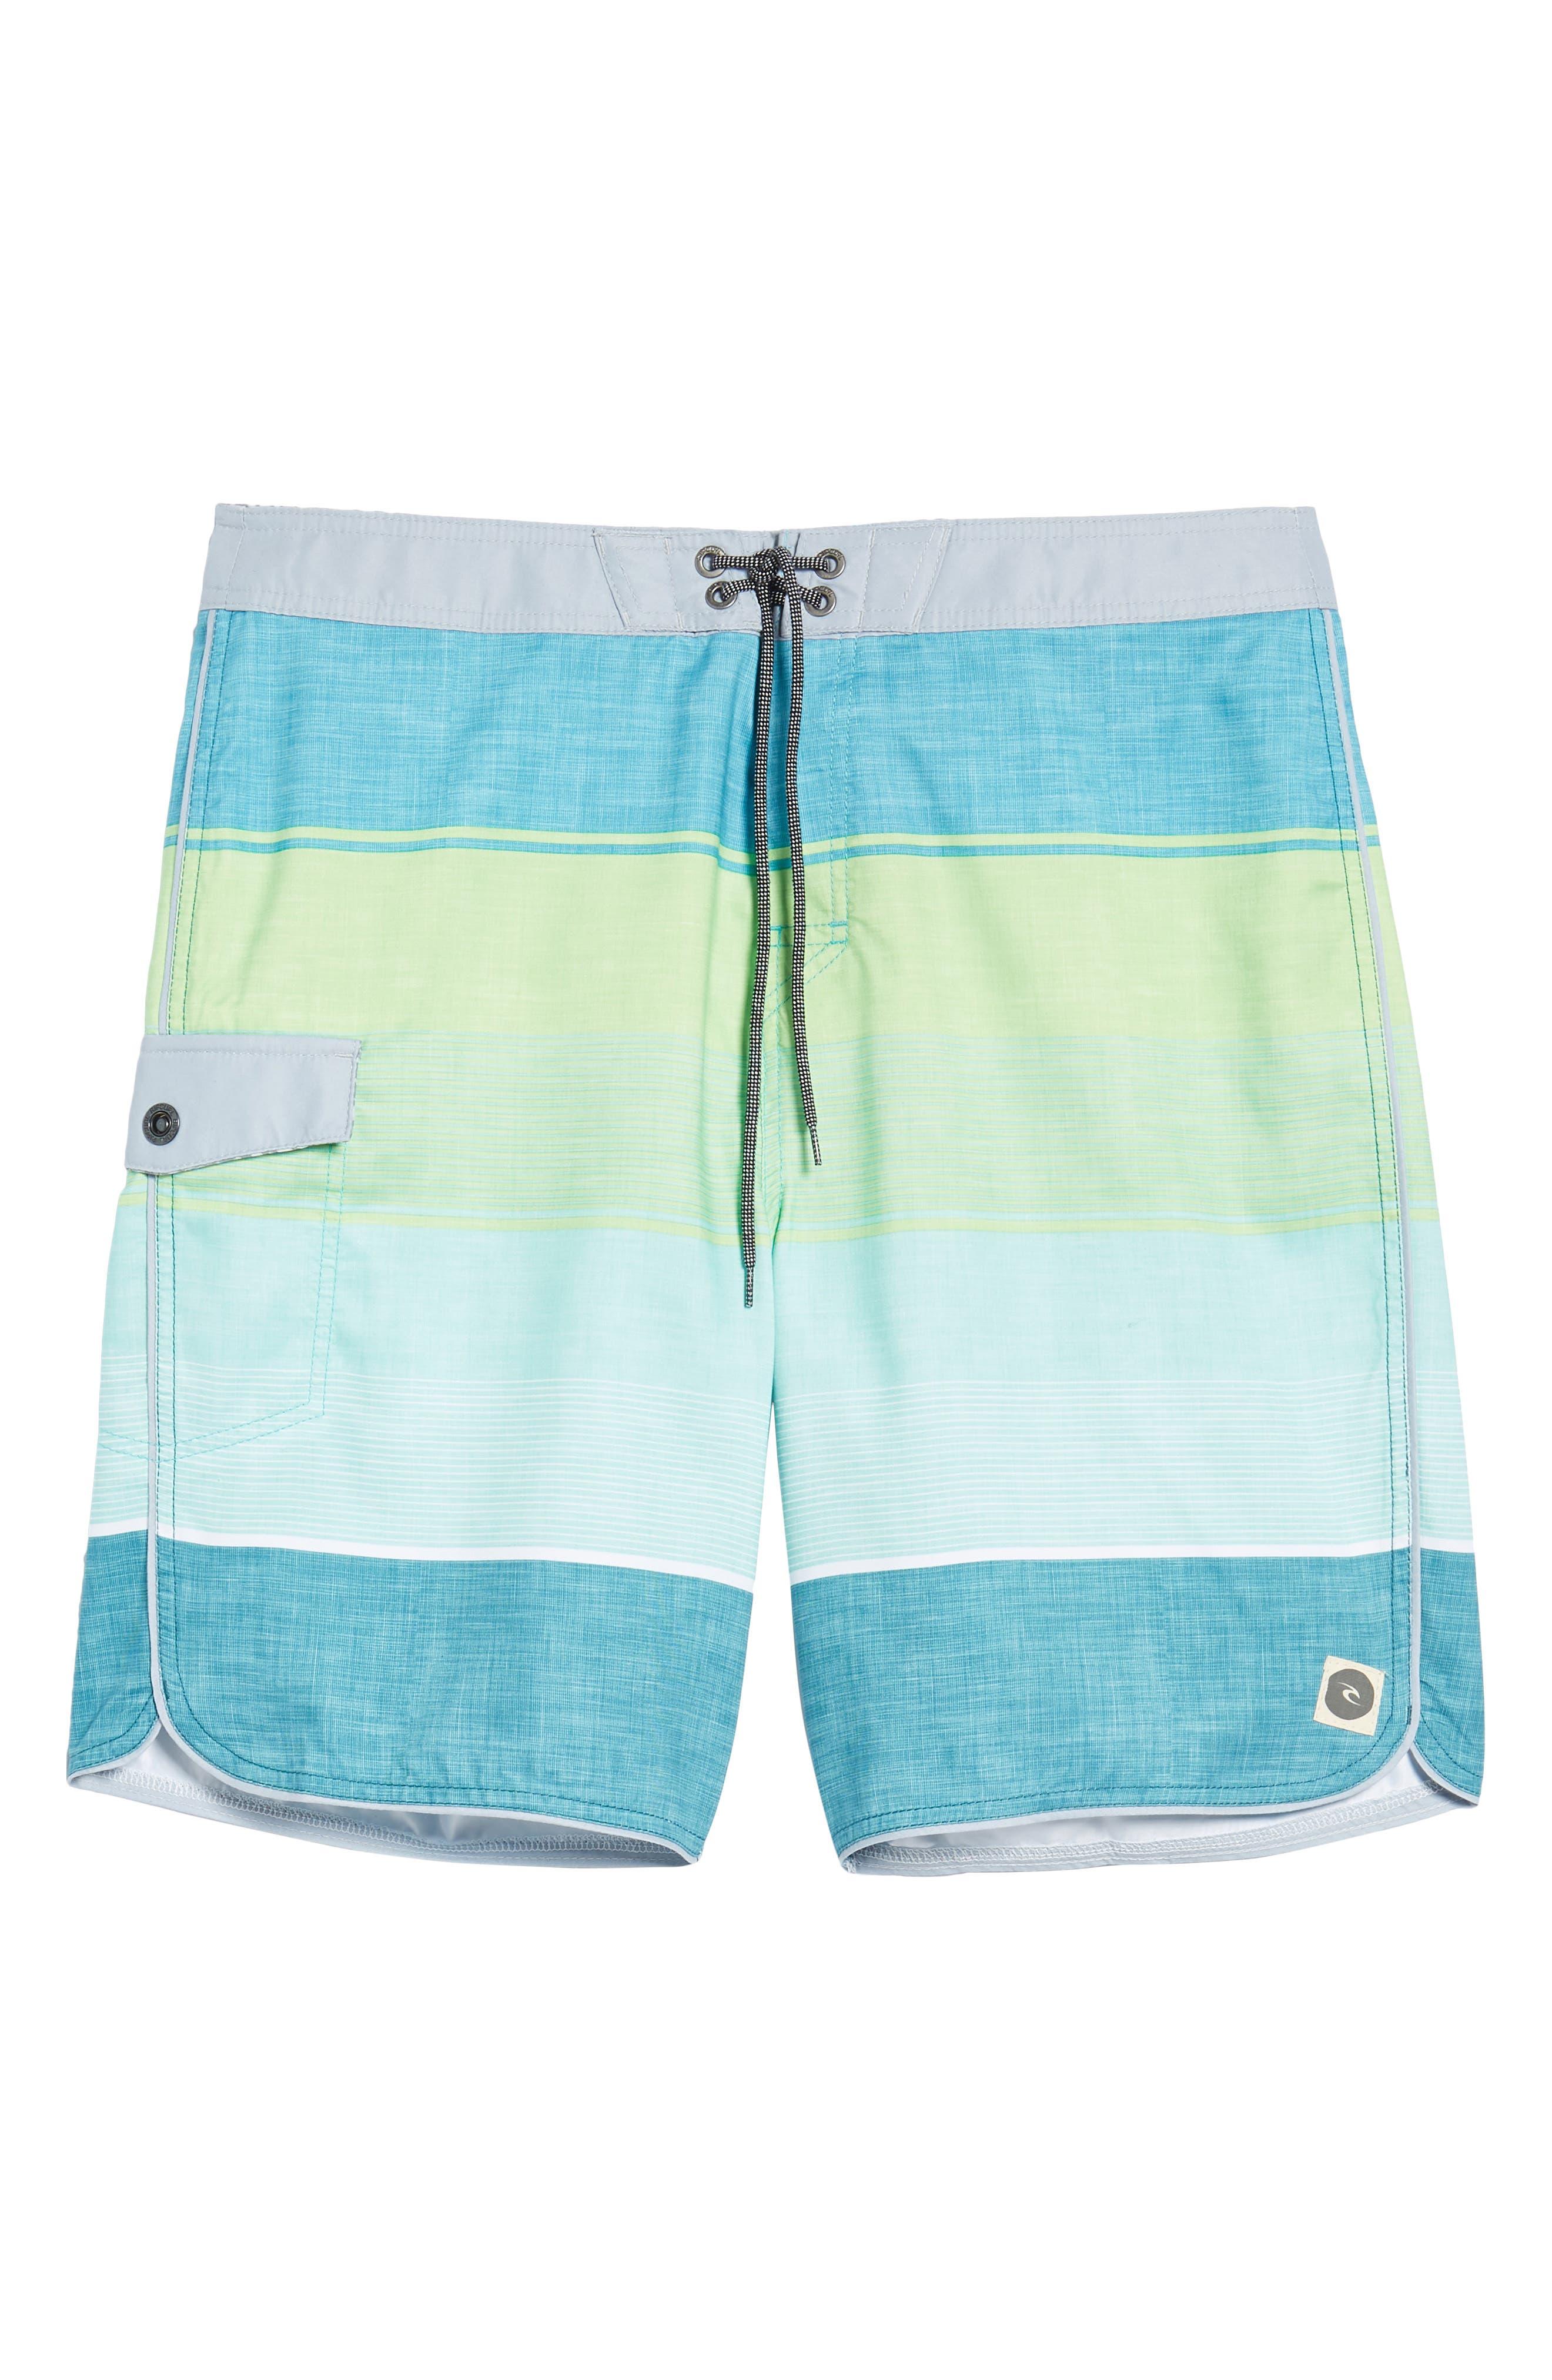 Good Vibes Board Shorts,                             Alternate thumbnail 6, color,                             Green